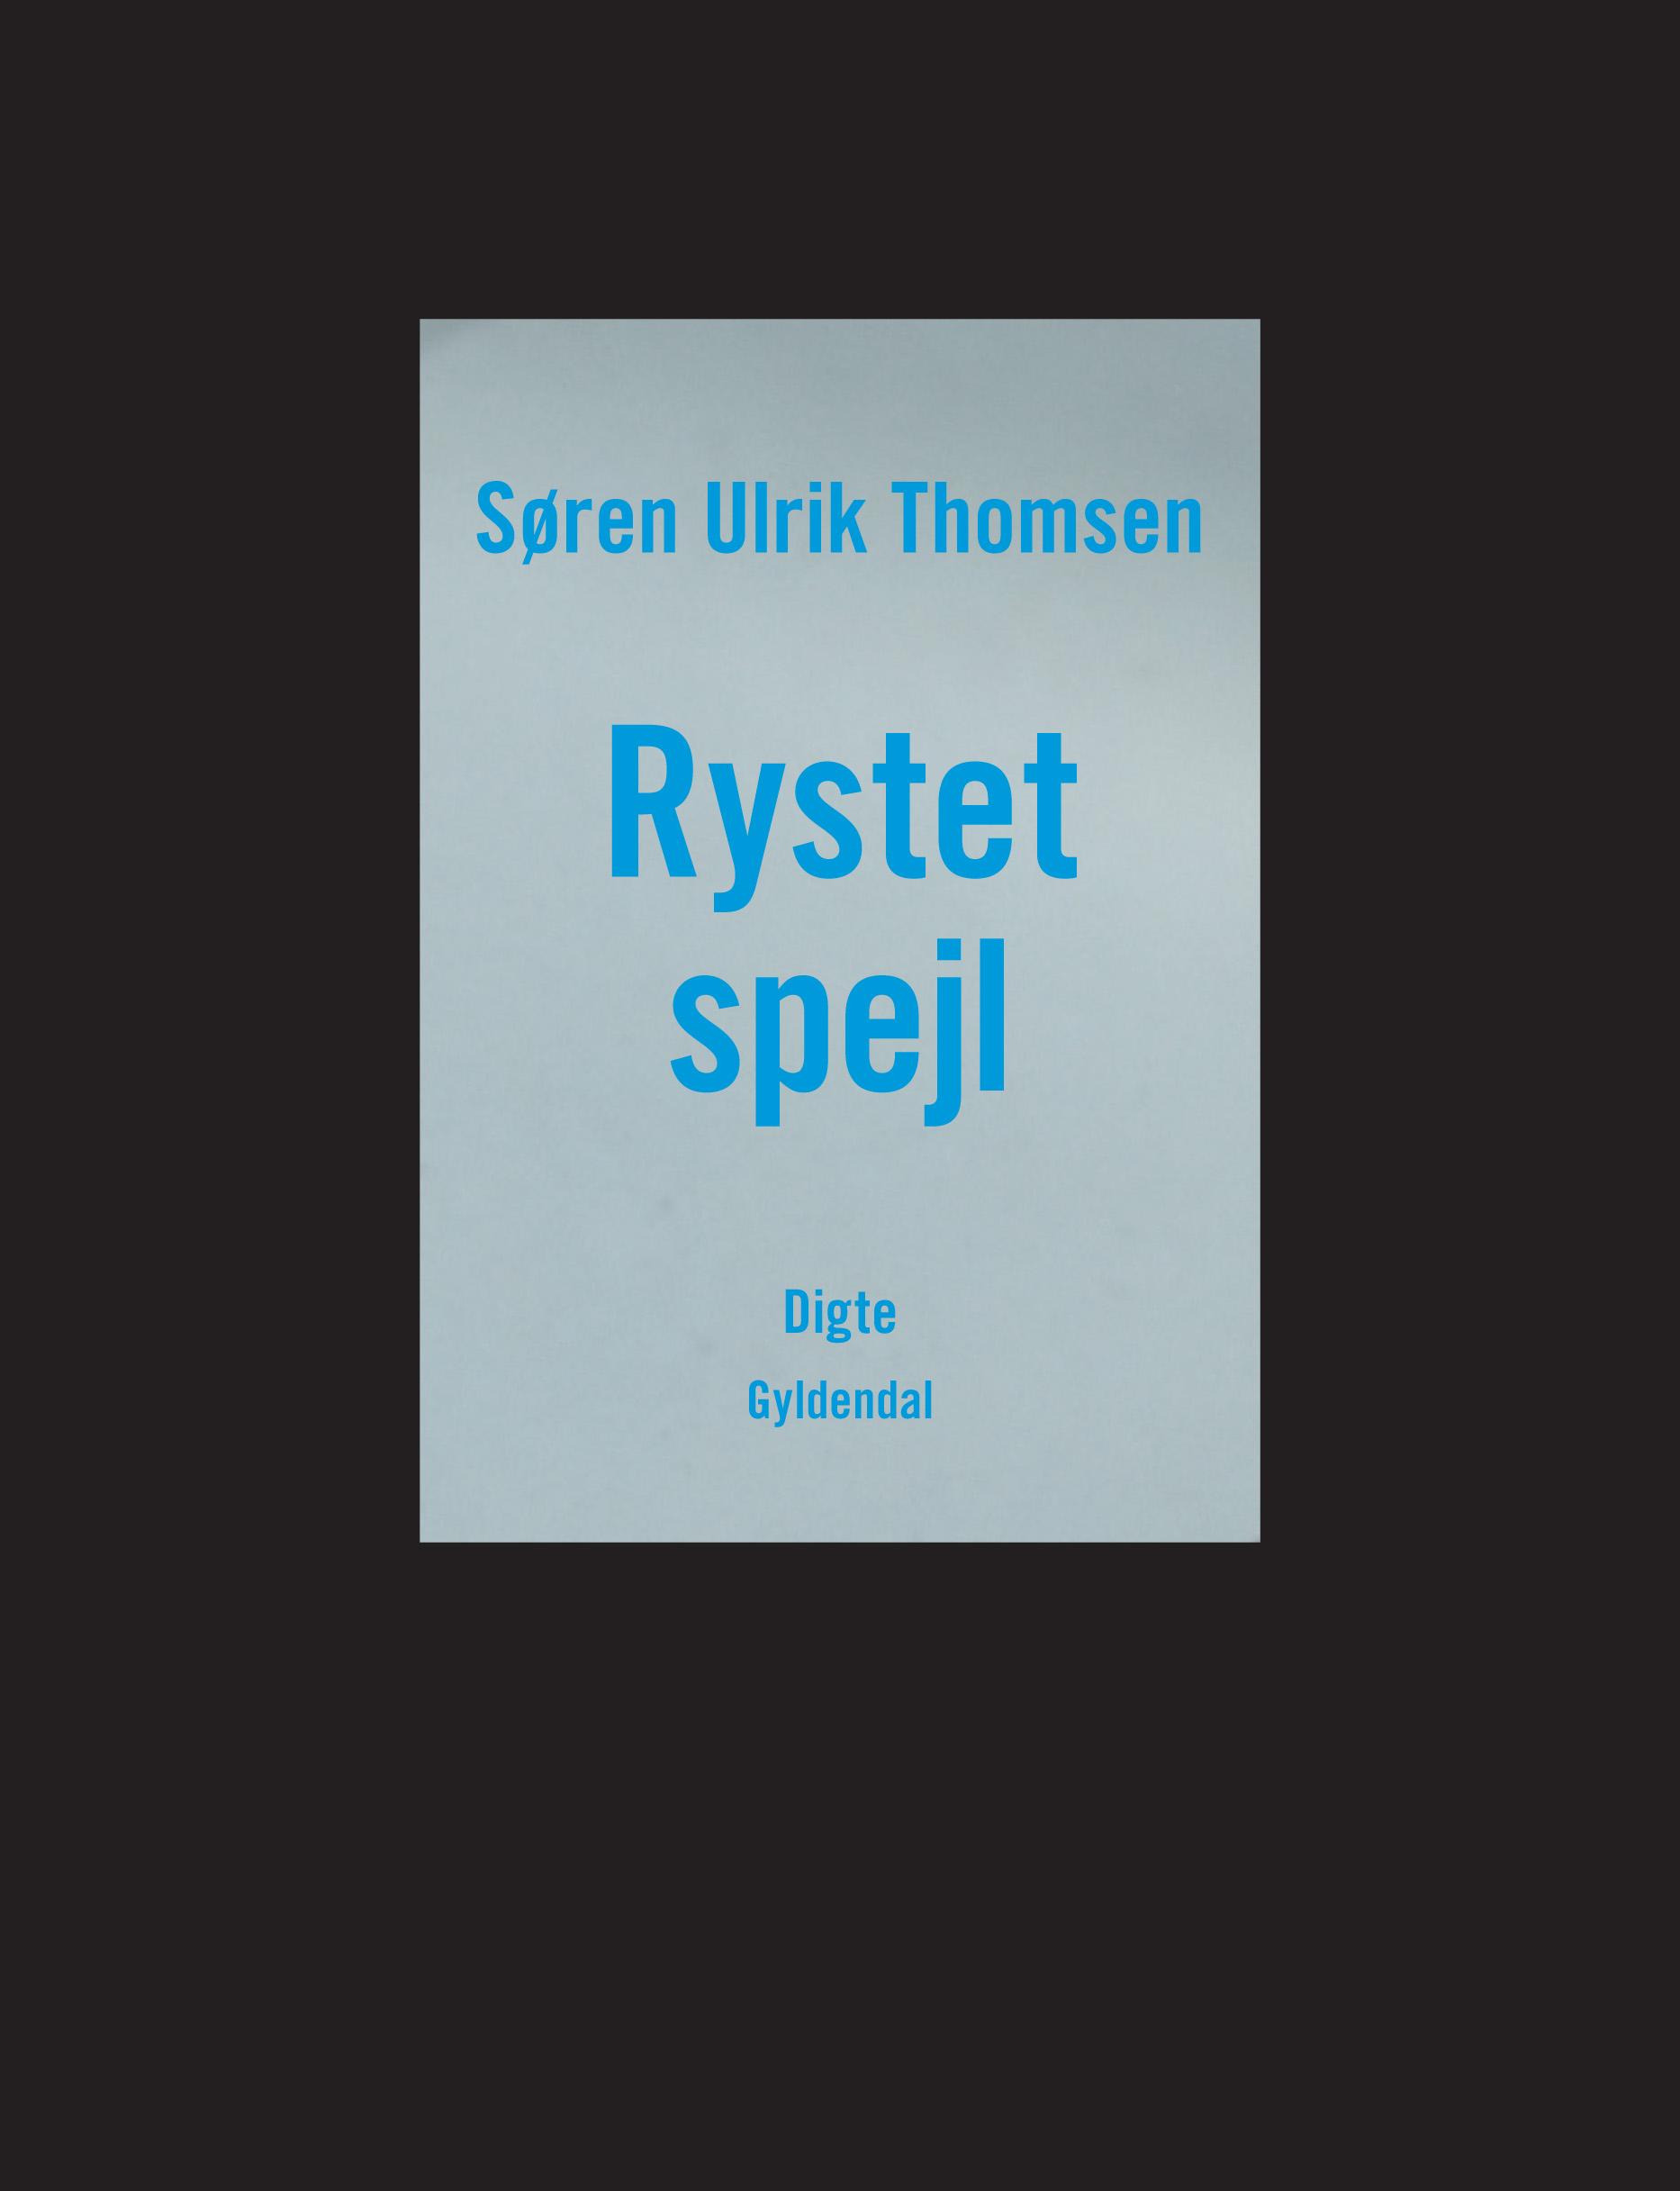 Søren Ulrik Thomsen: Rystet spejl. Digte